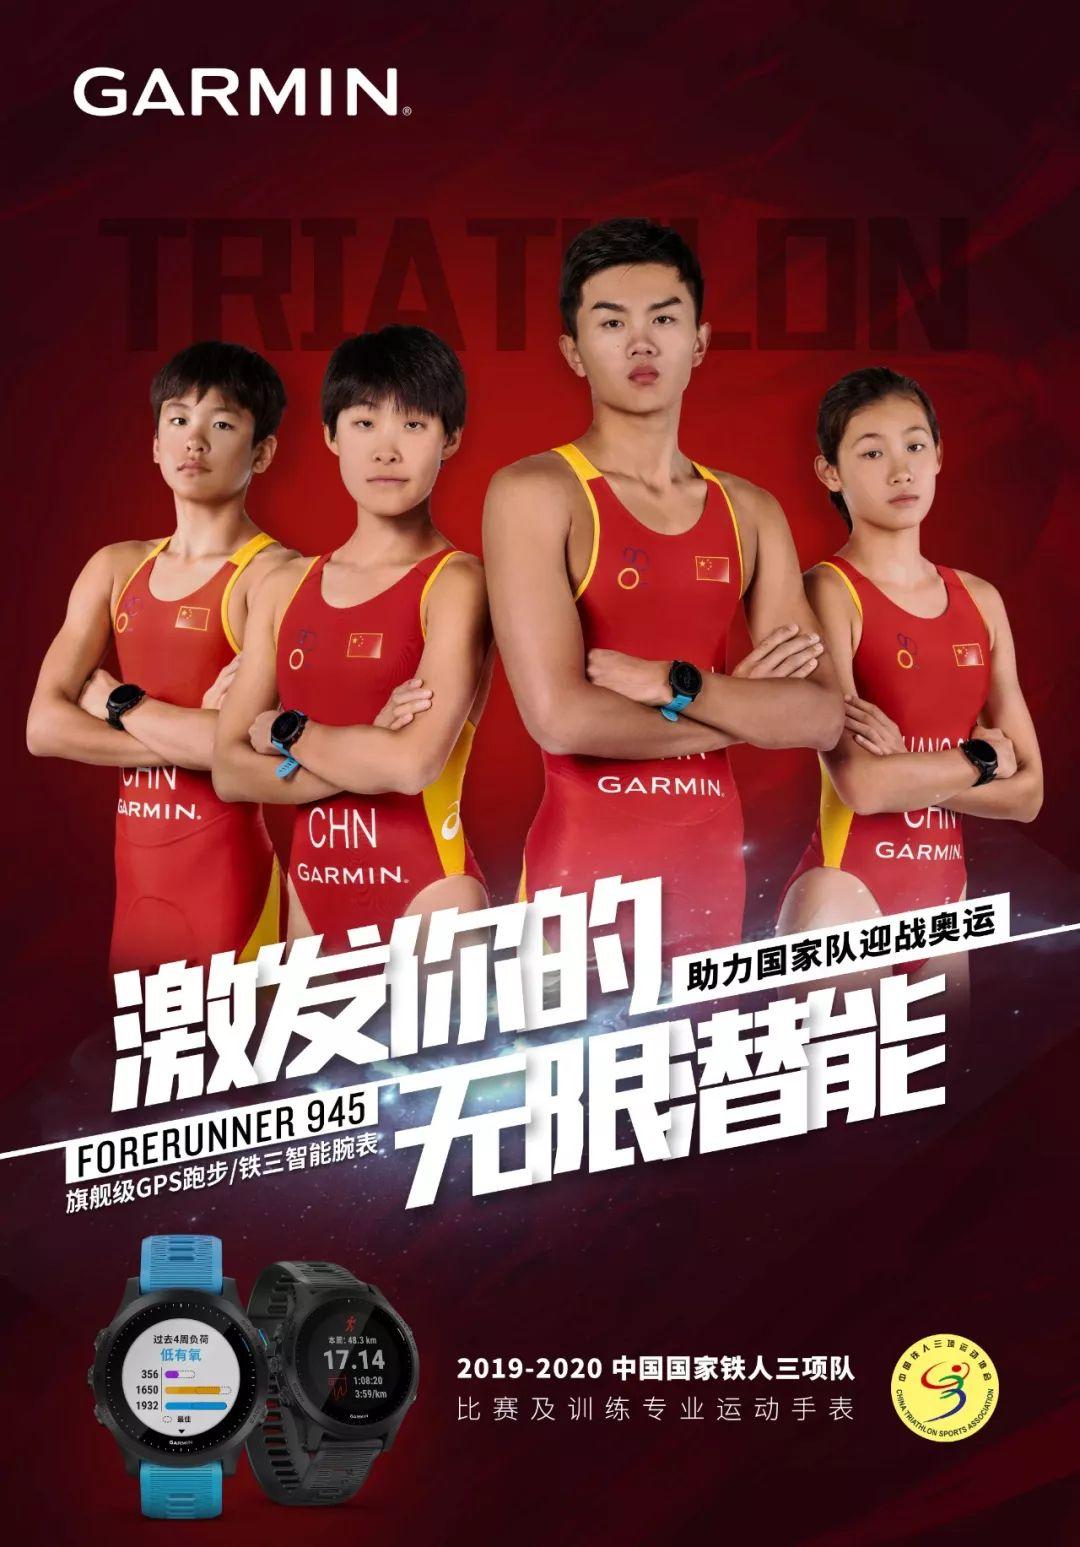 Garmin携手中国国家铁人三项队,助力东京奥运。